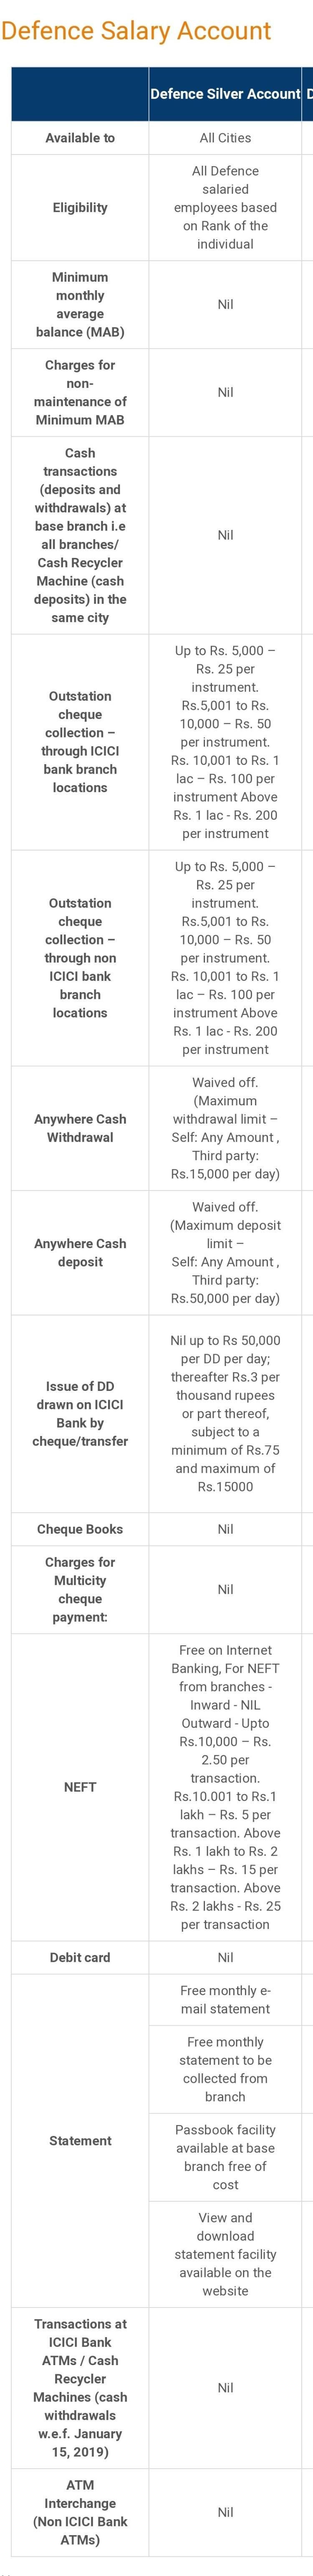 ICICI Bank DSP Account